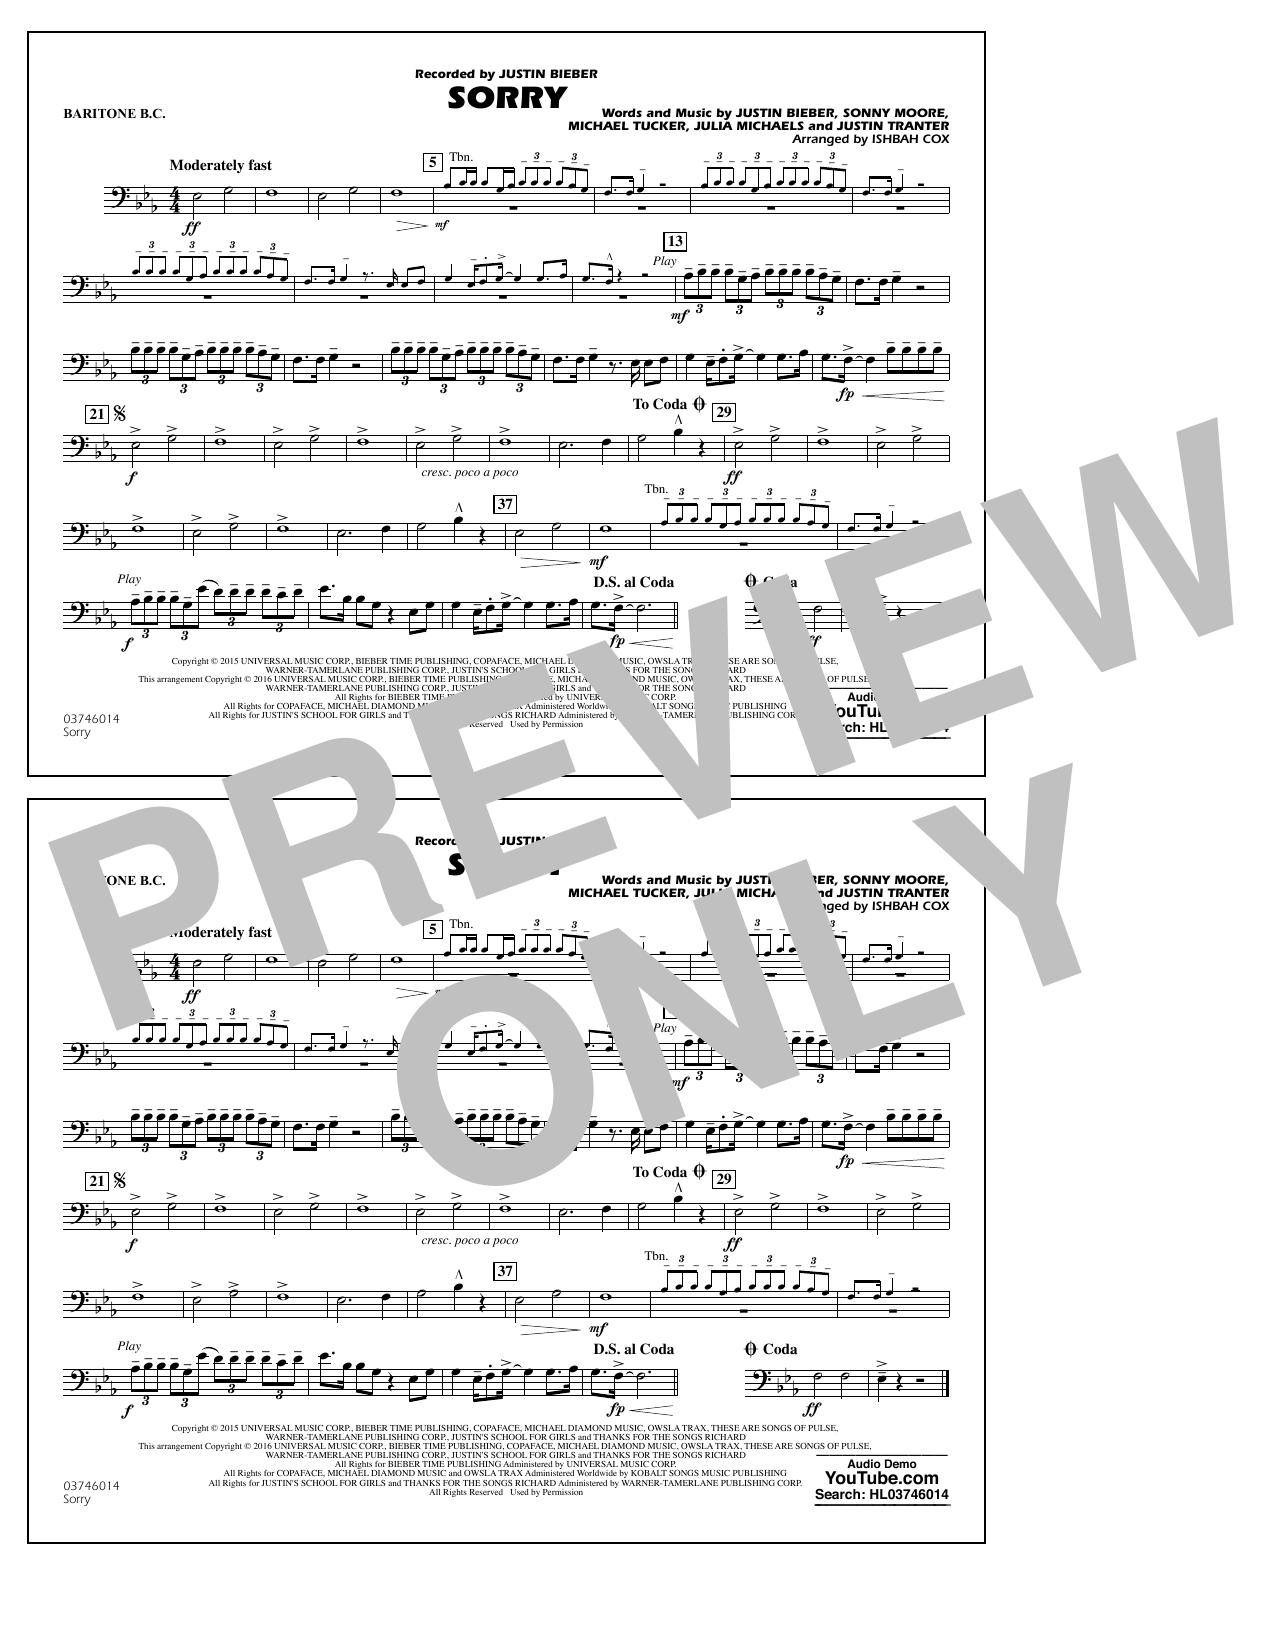 Sorry - Baritone B.C. (Marching Band)